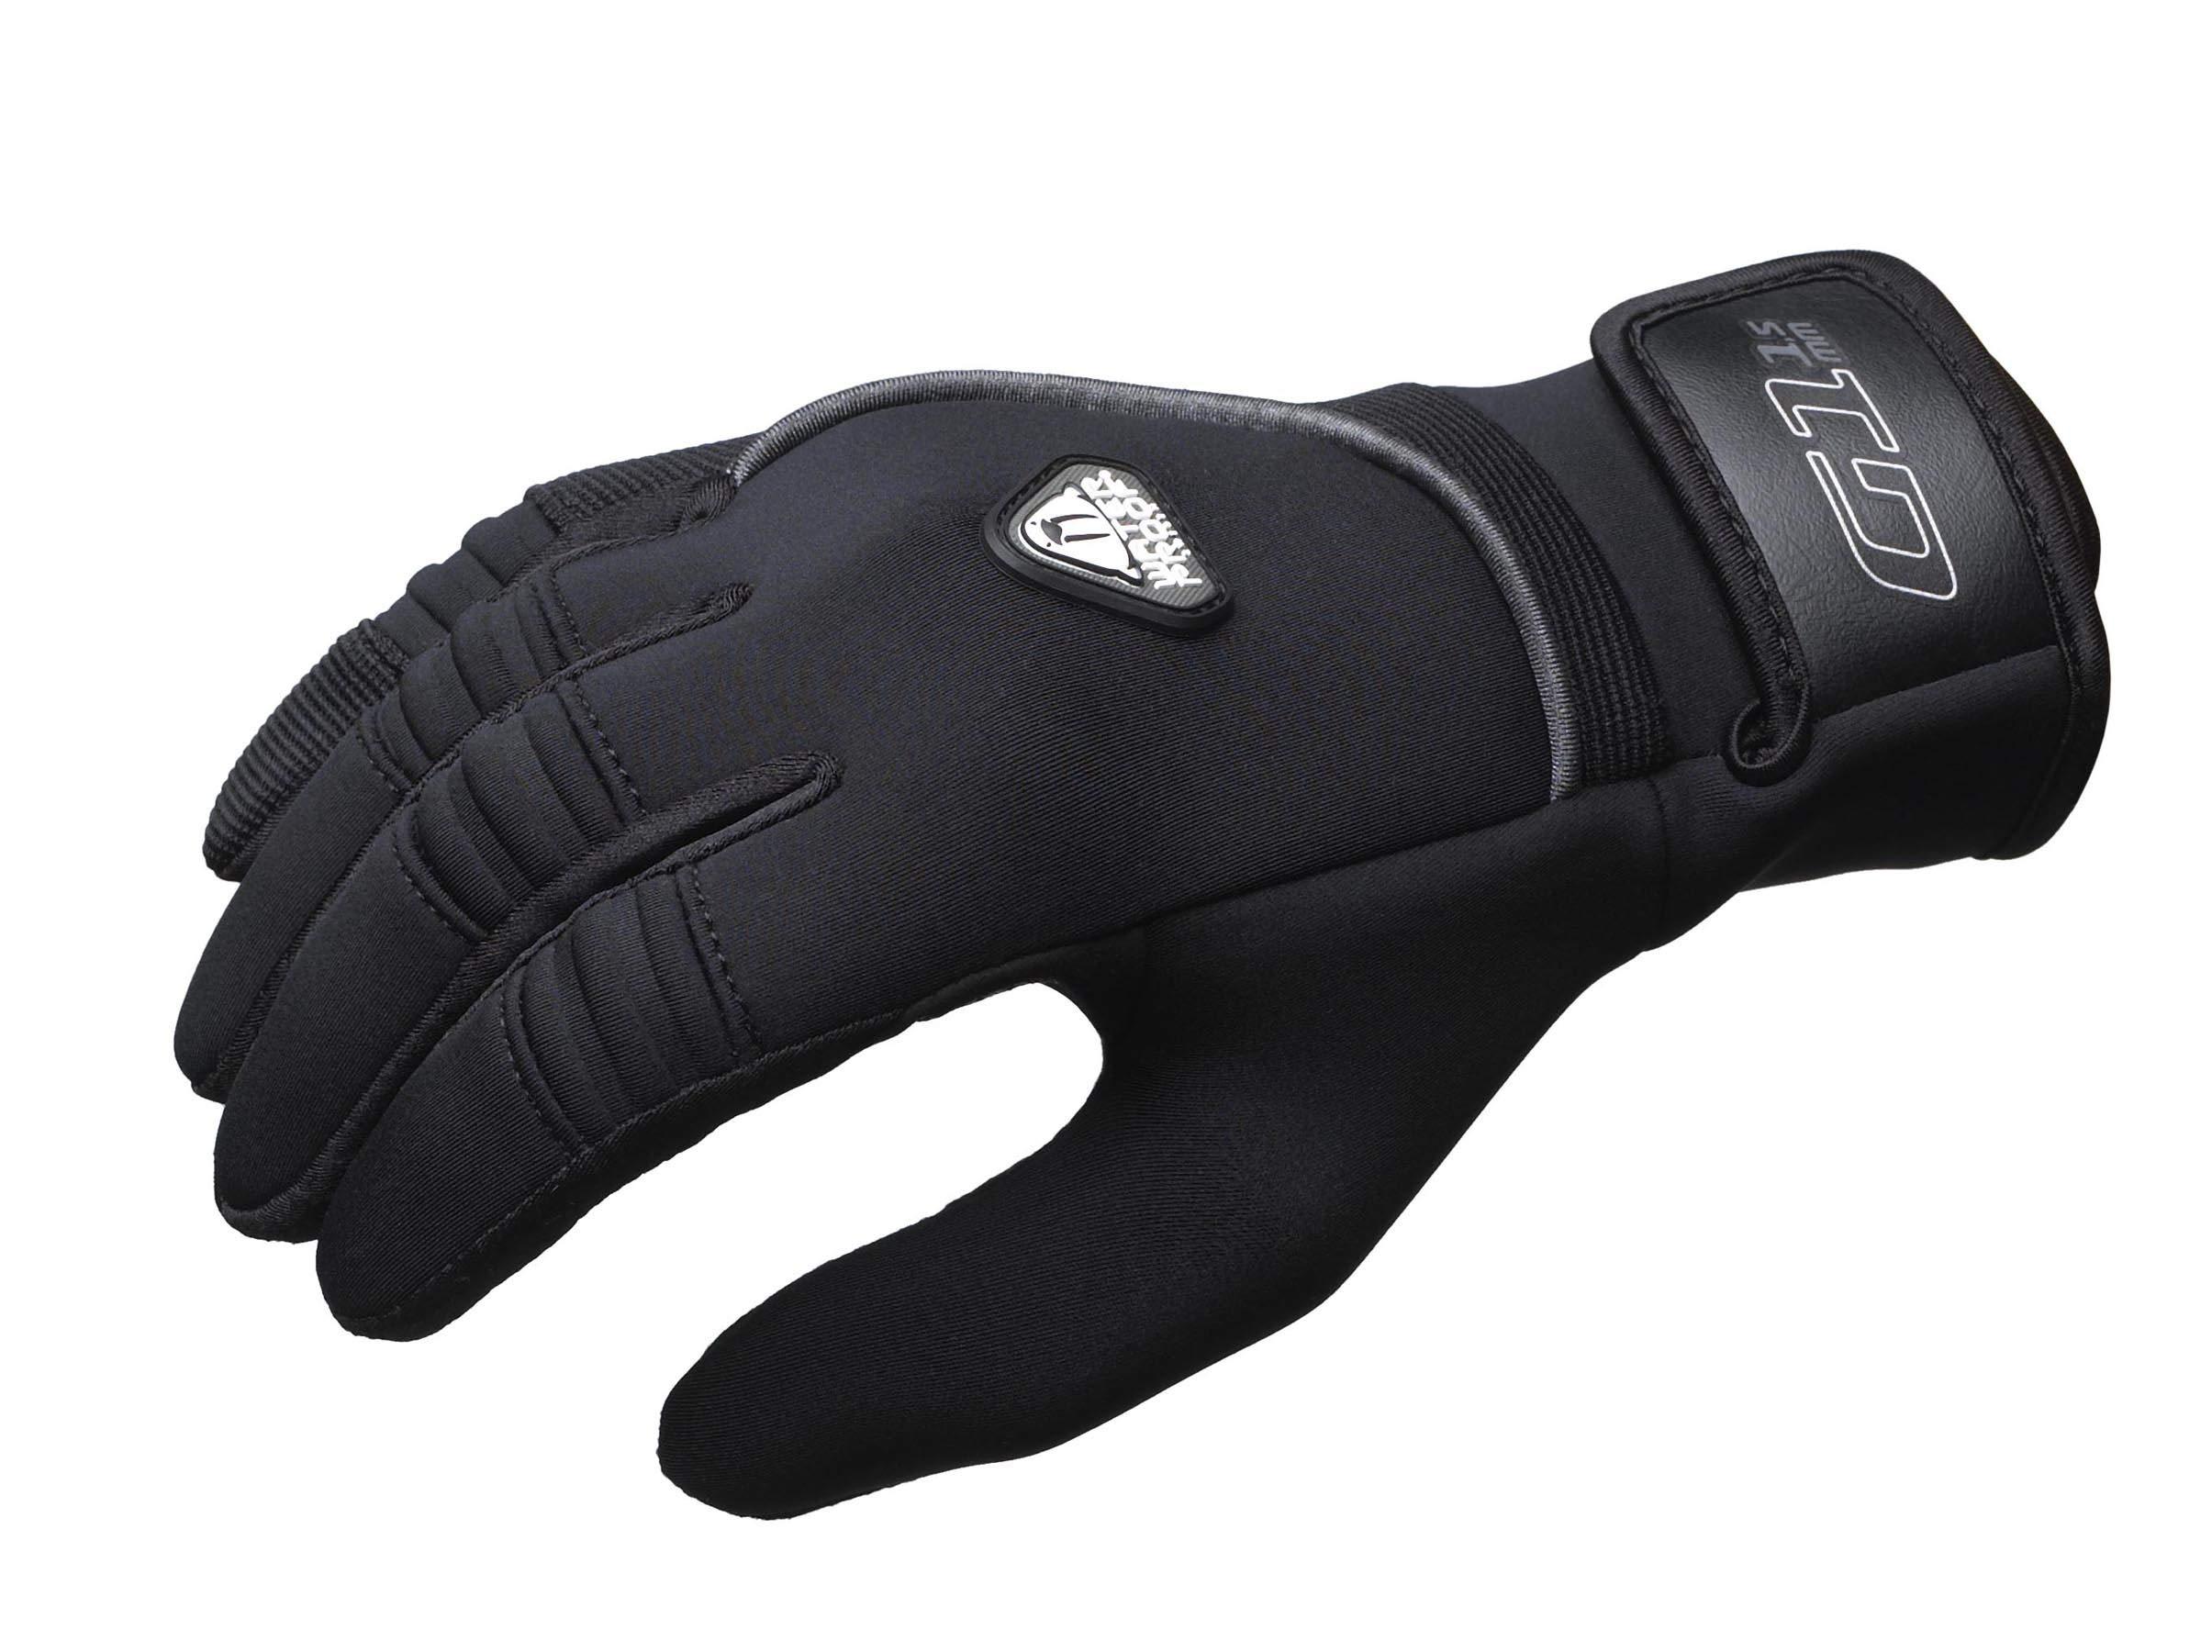 Waterproof G1 1.5mm Tropic Gloves, X-Small